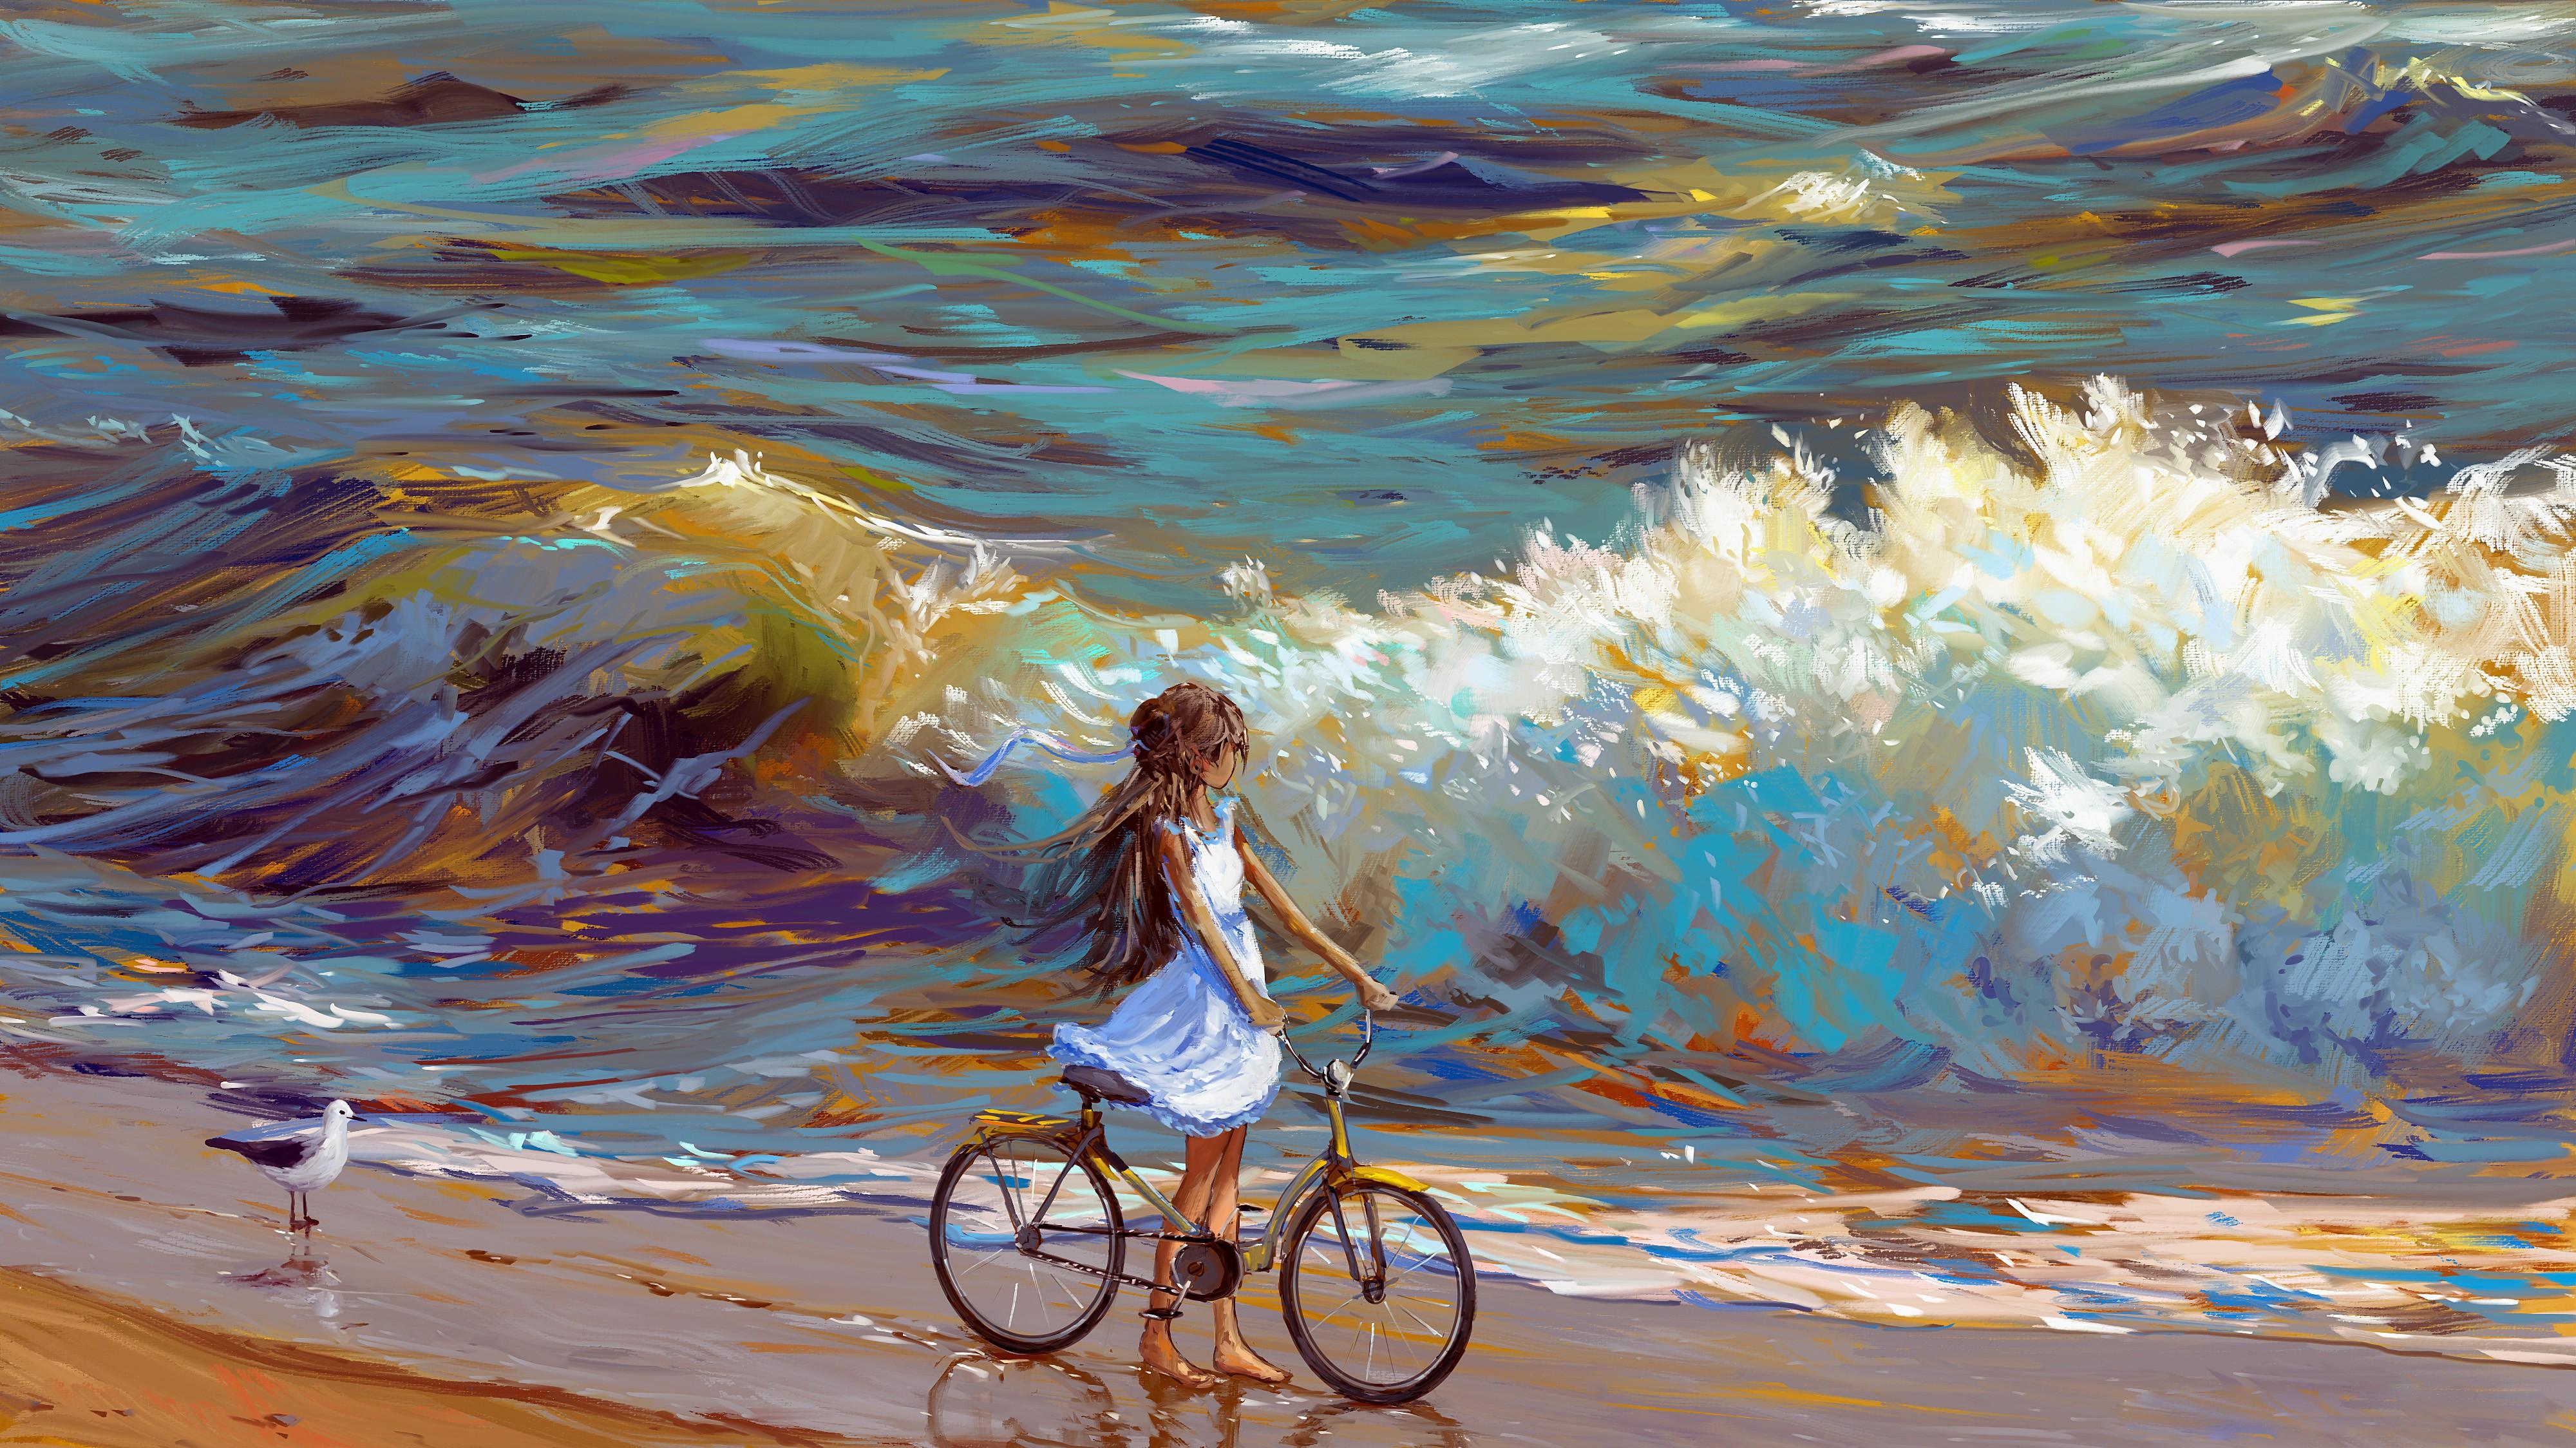 Amazing Water Paintings